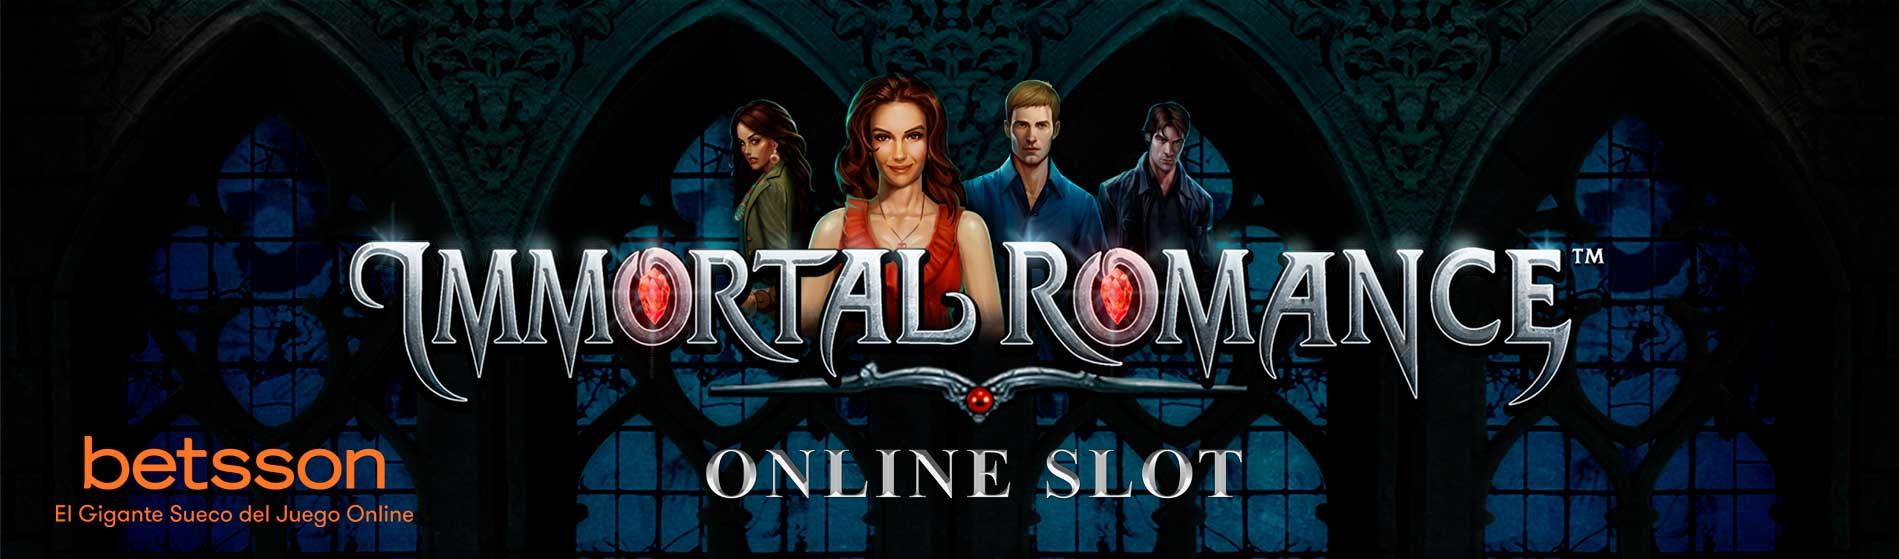 Slot Online Immortal Romance